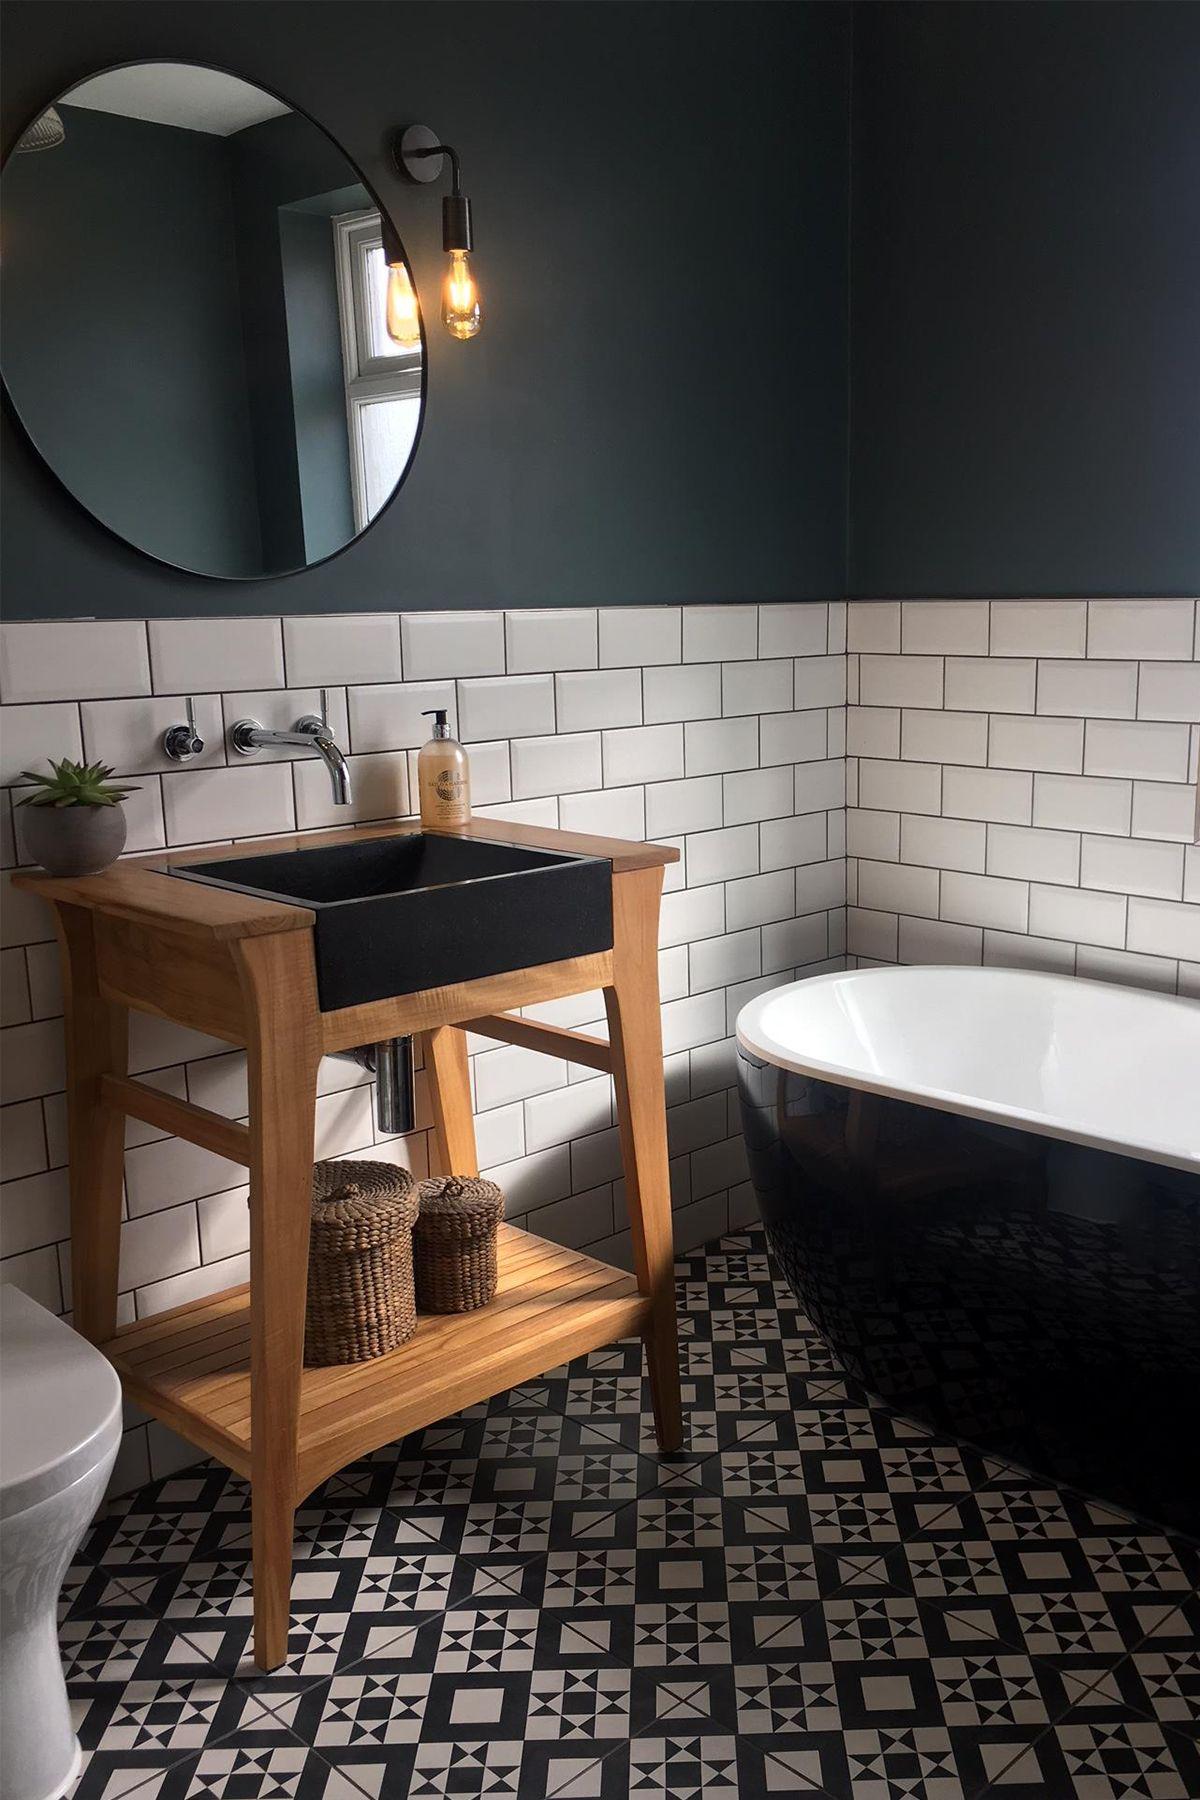 Small, dark bathroom